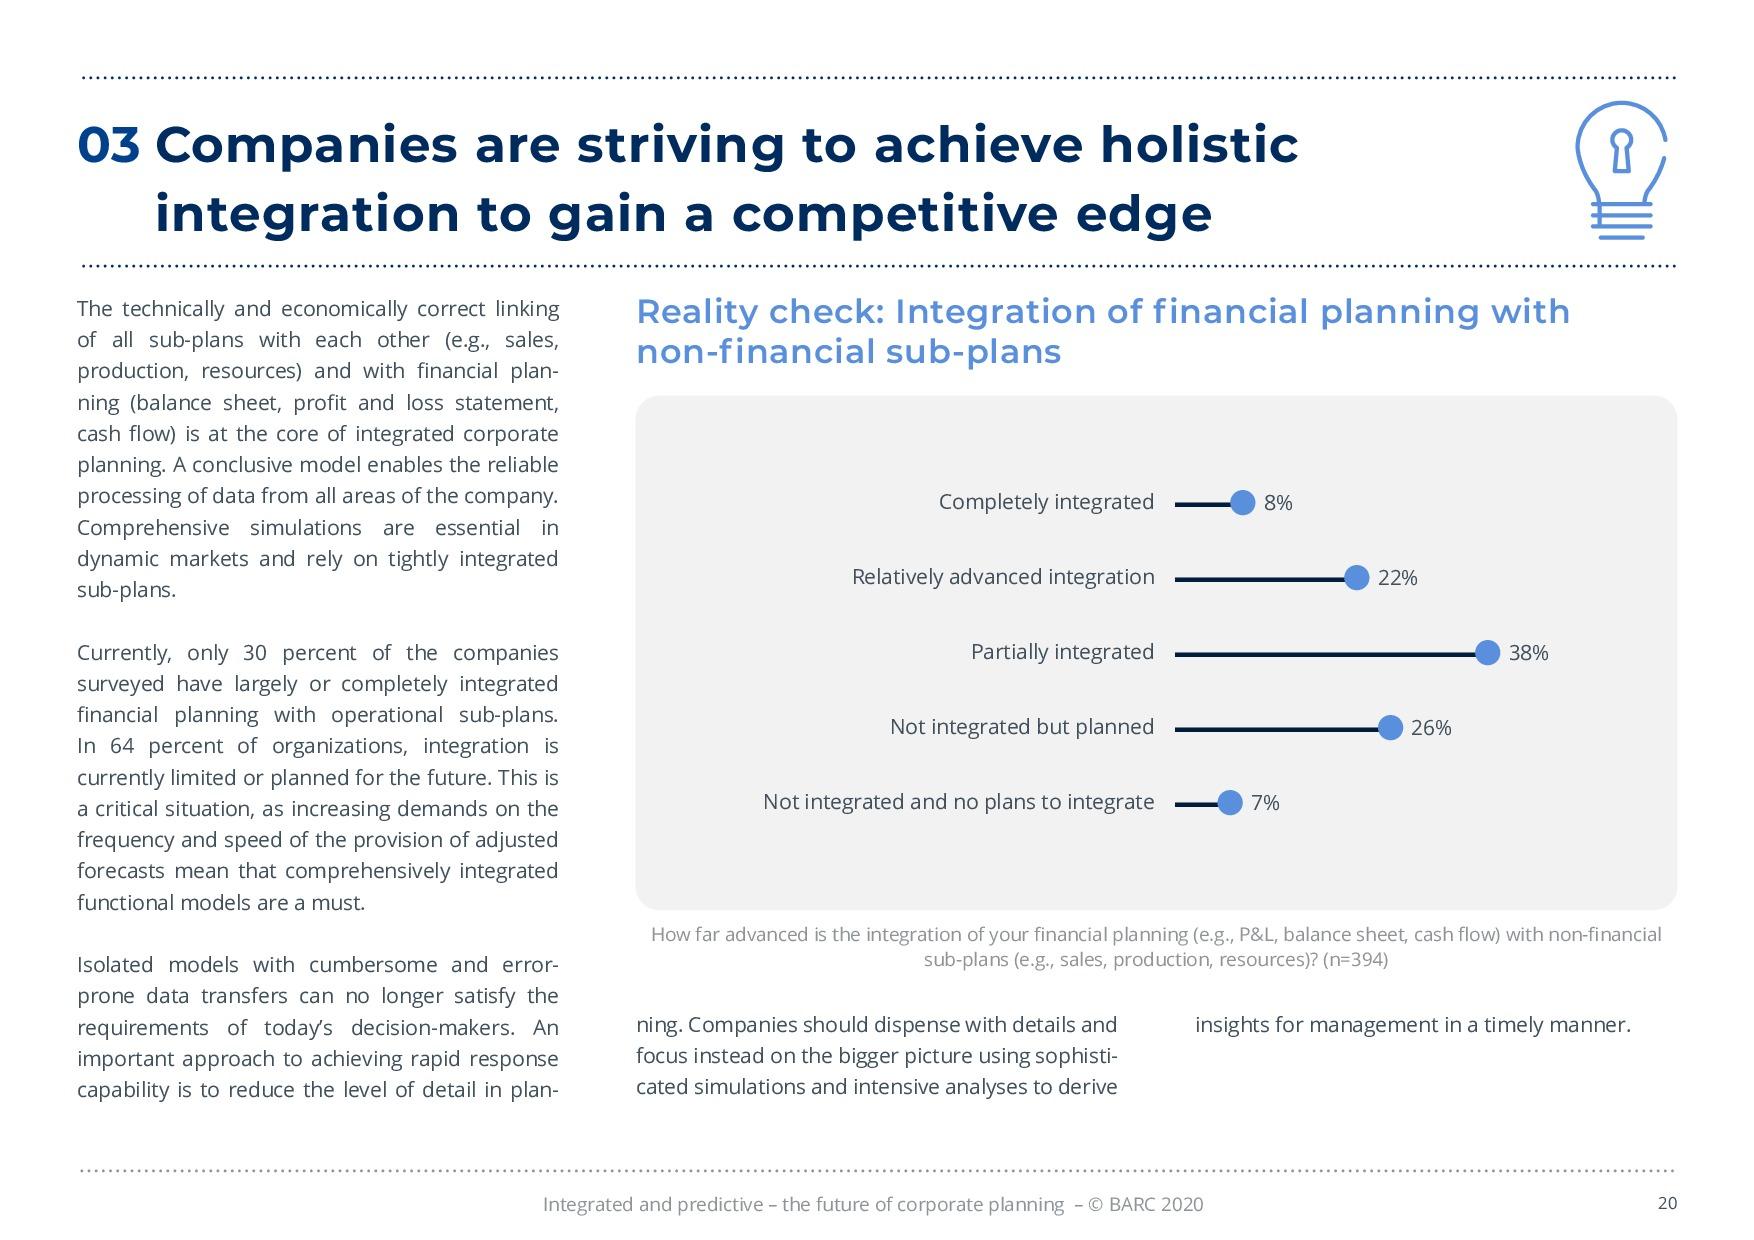 BARC – 統合と予測 – 経営計画の未来 | Page 20